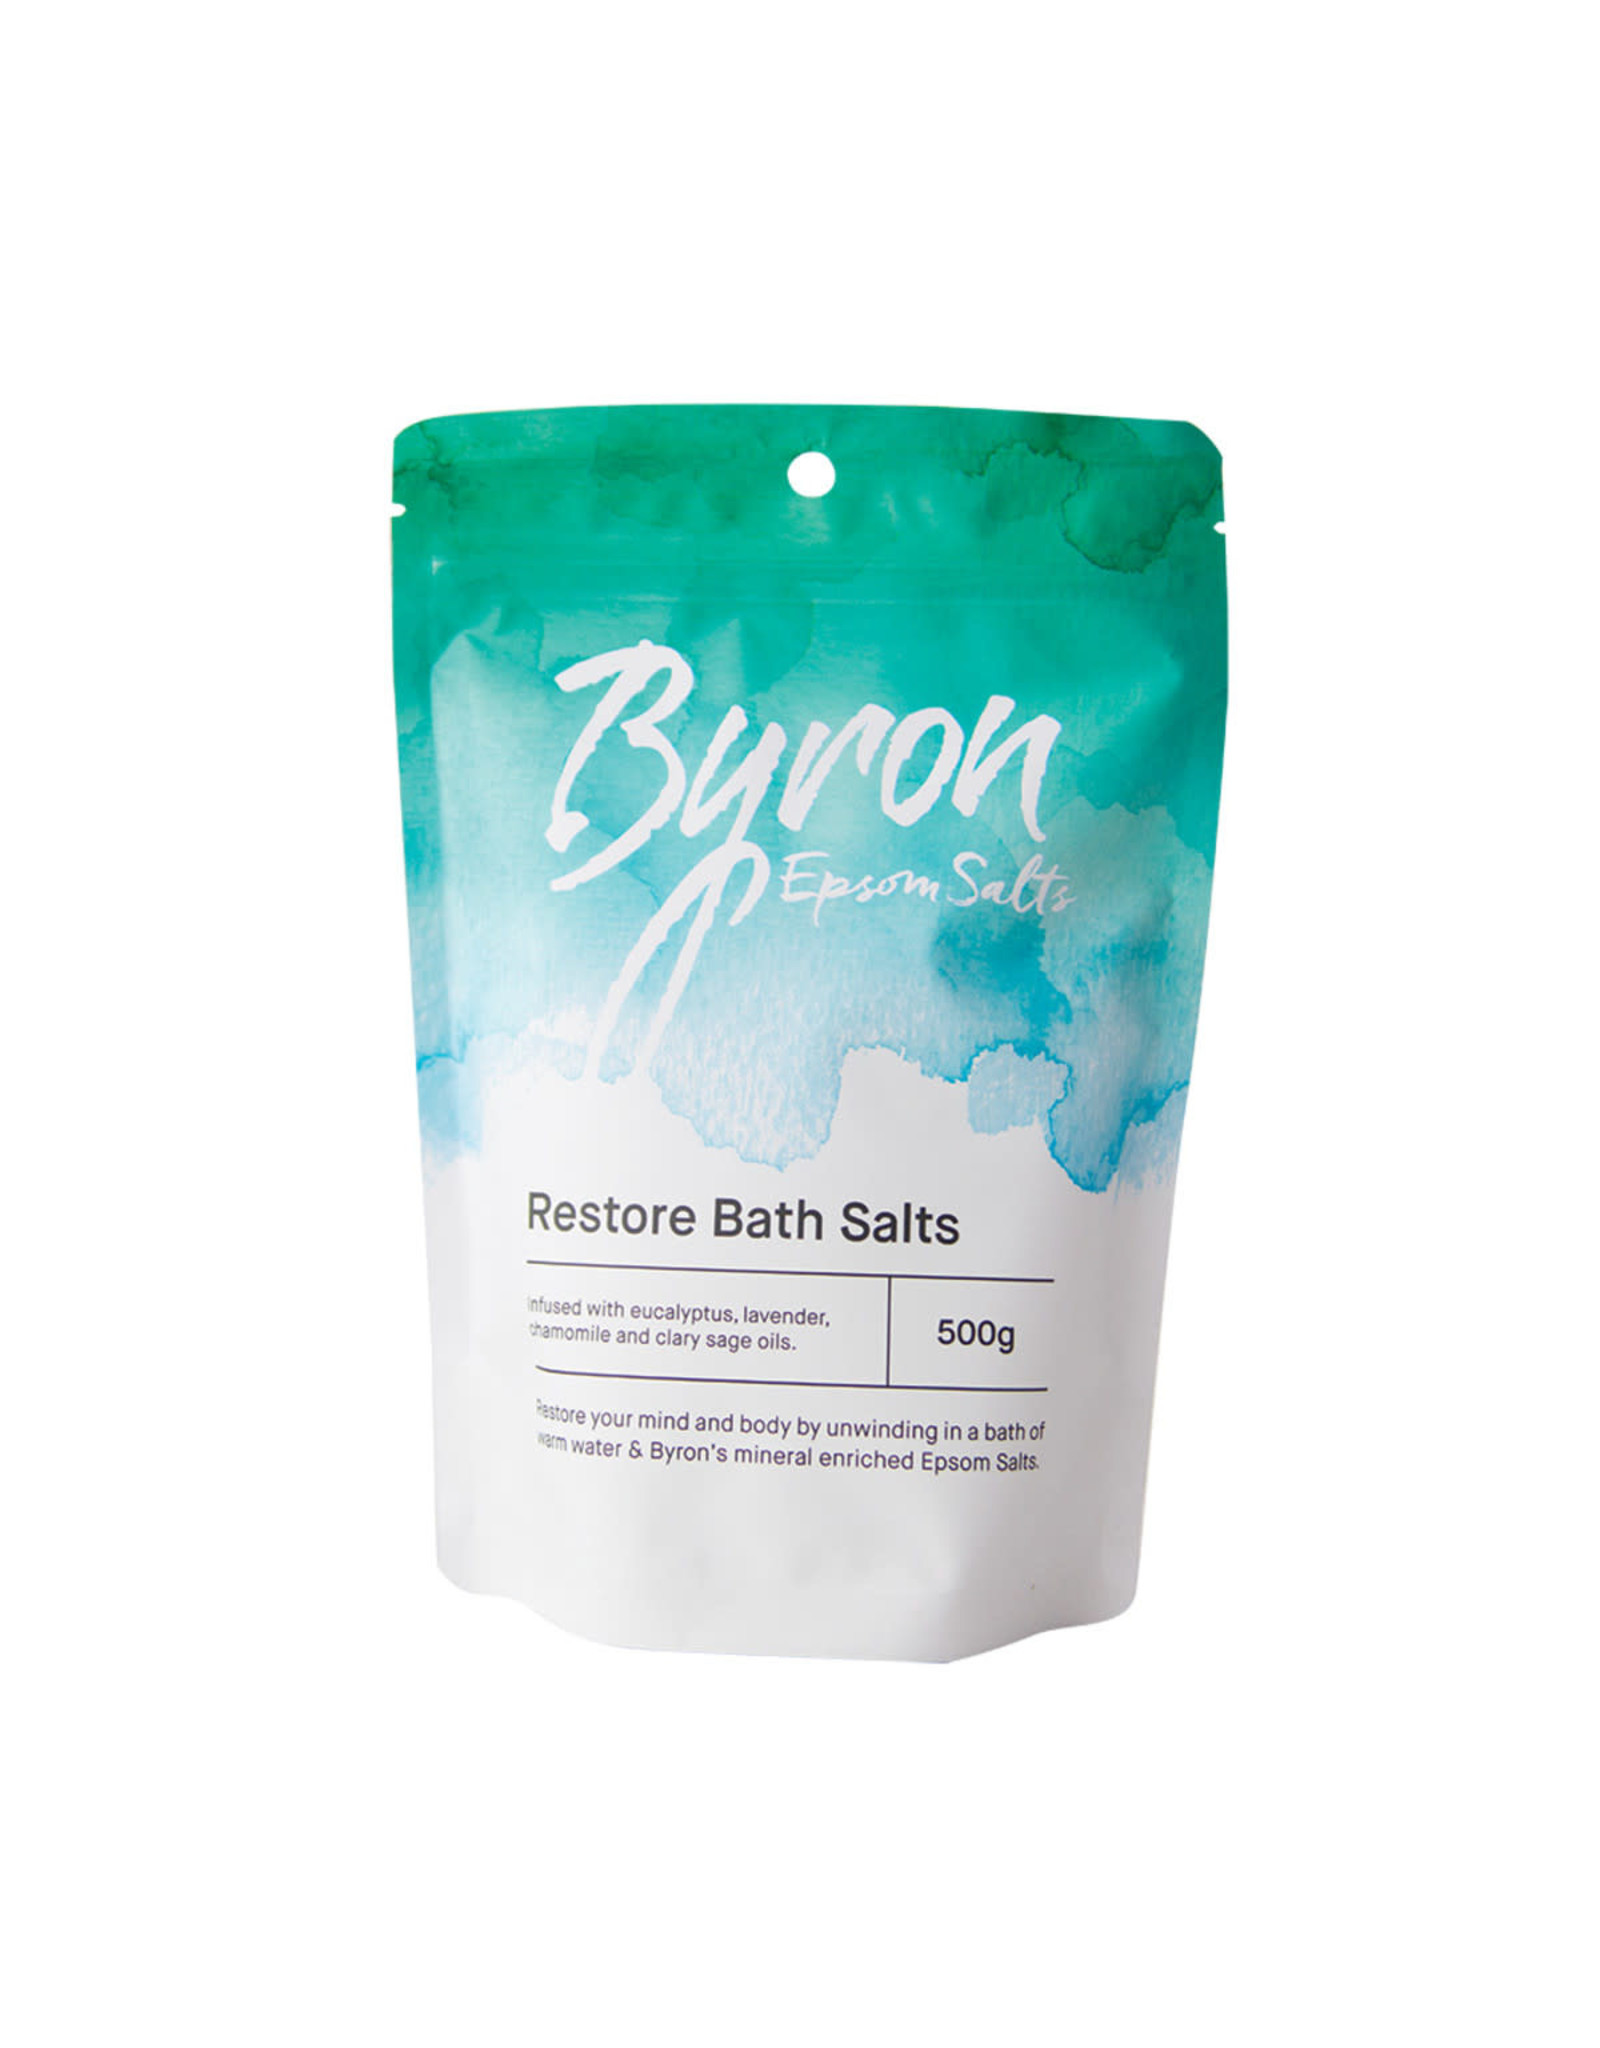 Byron Bath Salts Restore Bath Salts 500g